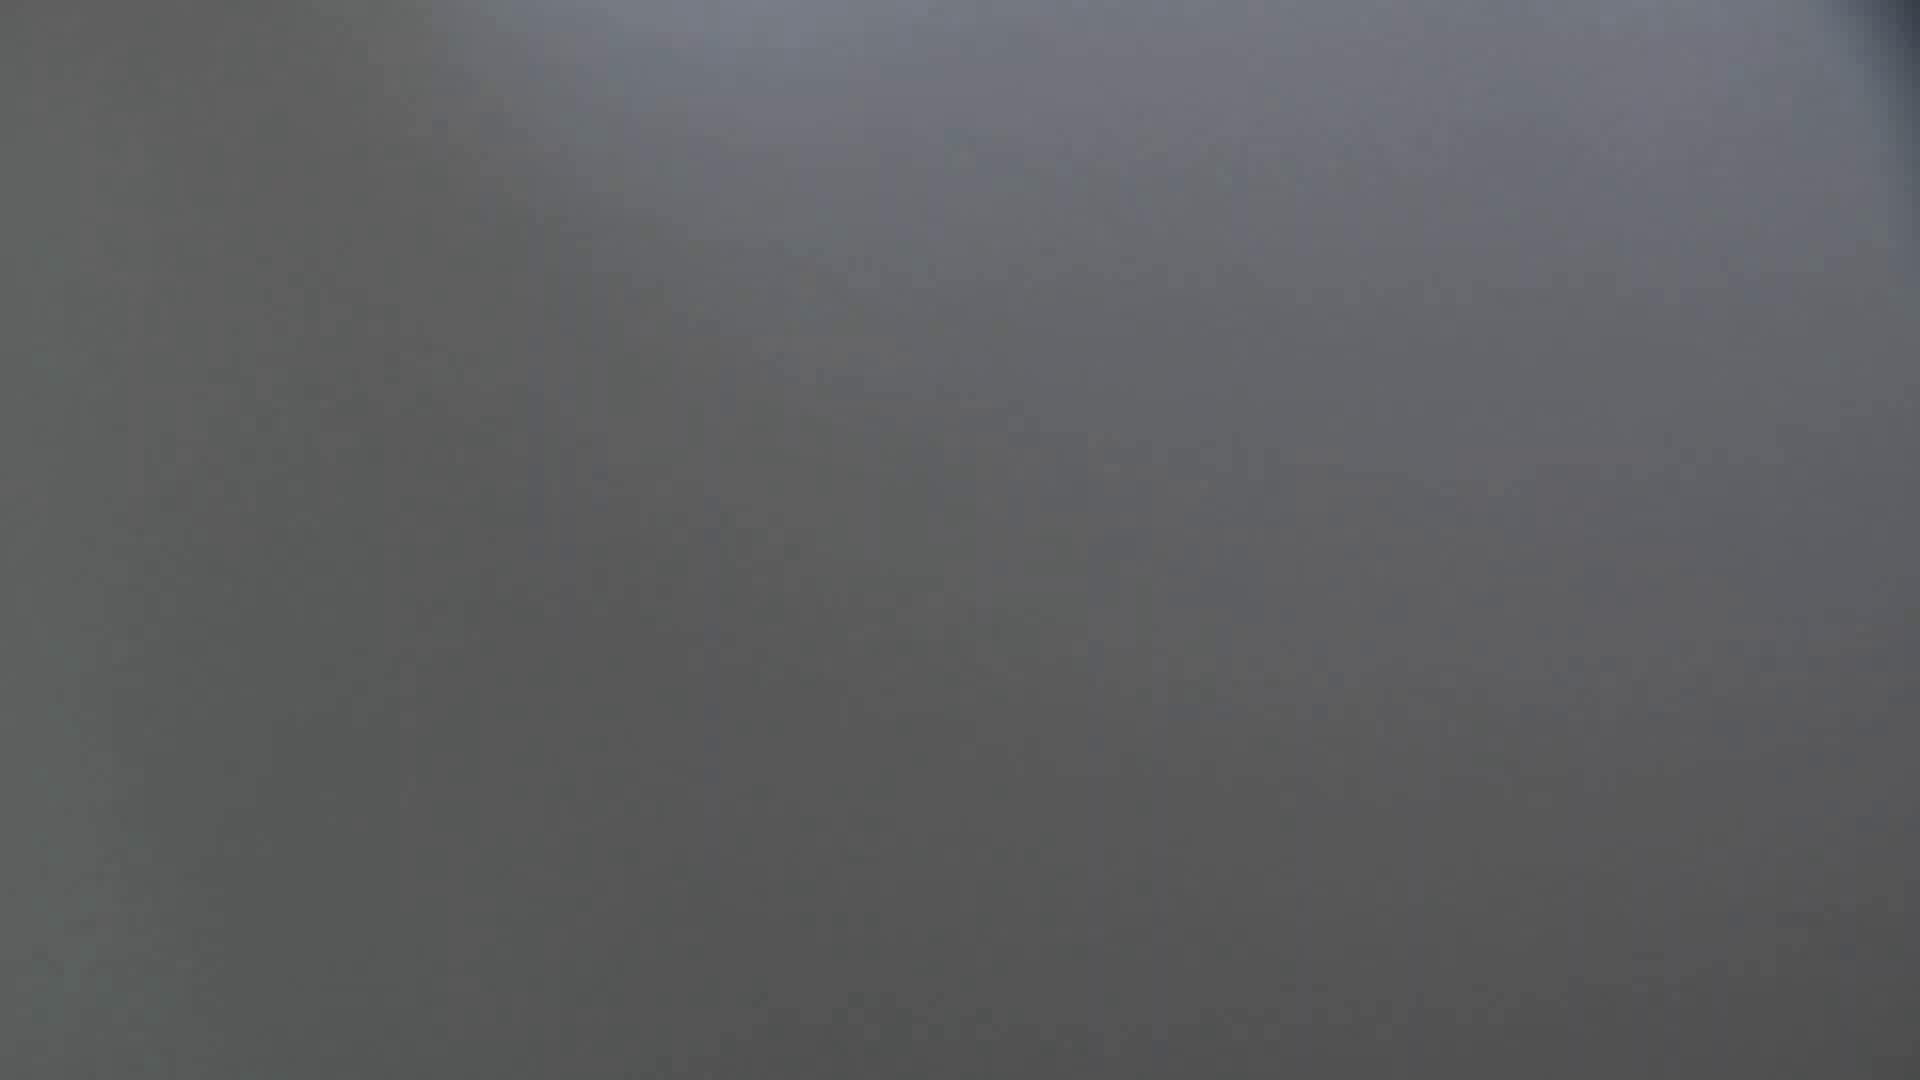 vol.25三十時間潜り、一つしか出会えない完璧桃尻編 byお銀 美人の裸体 おまんこ動画流出 106枚 80